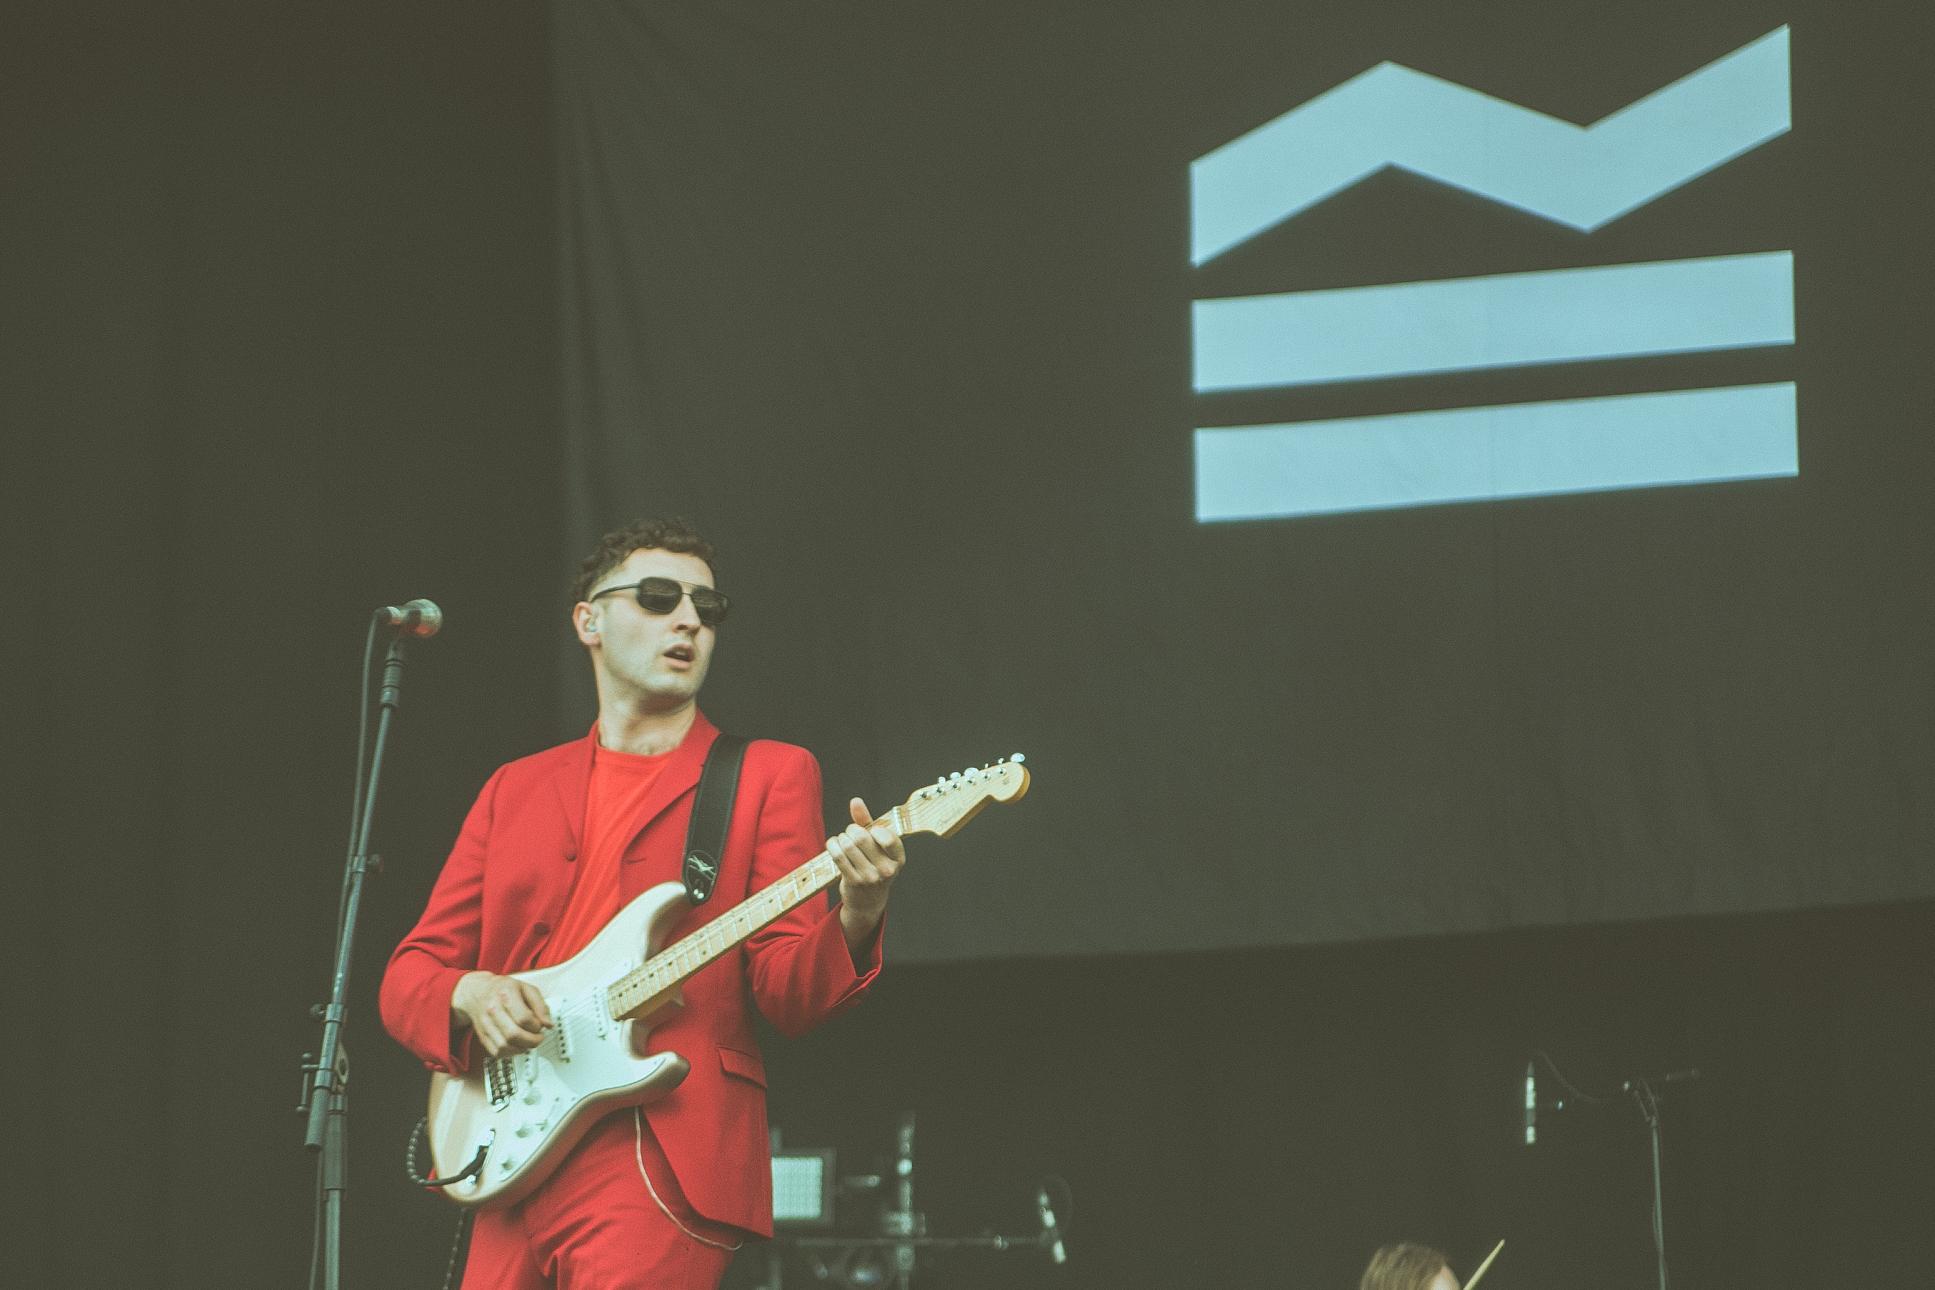 Sea Girls - Community Festival 2019 - Ant Adams-3.jpg